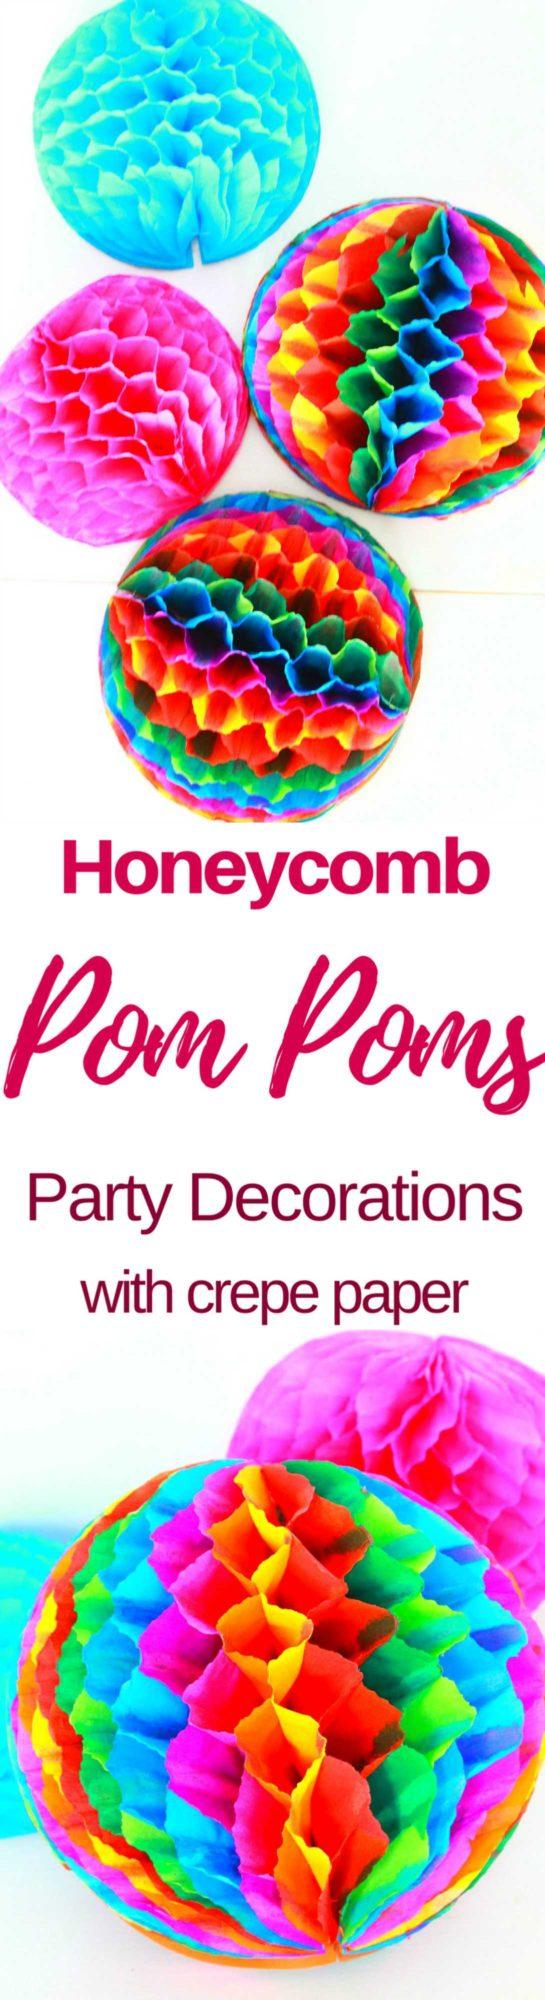 Honeycomb pom poms